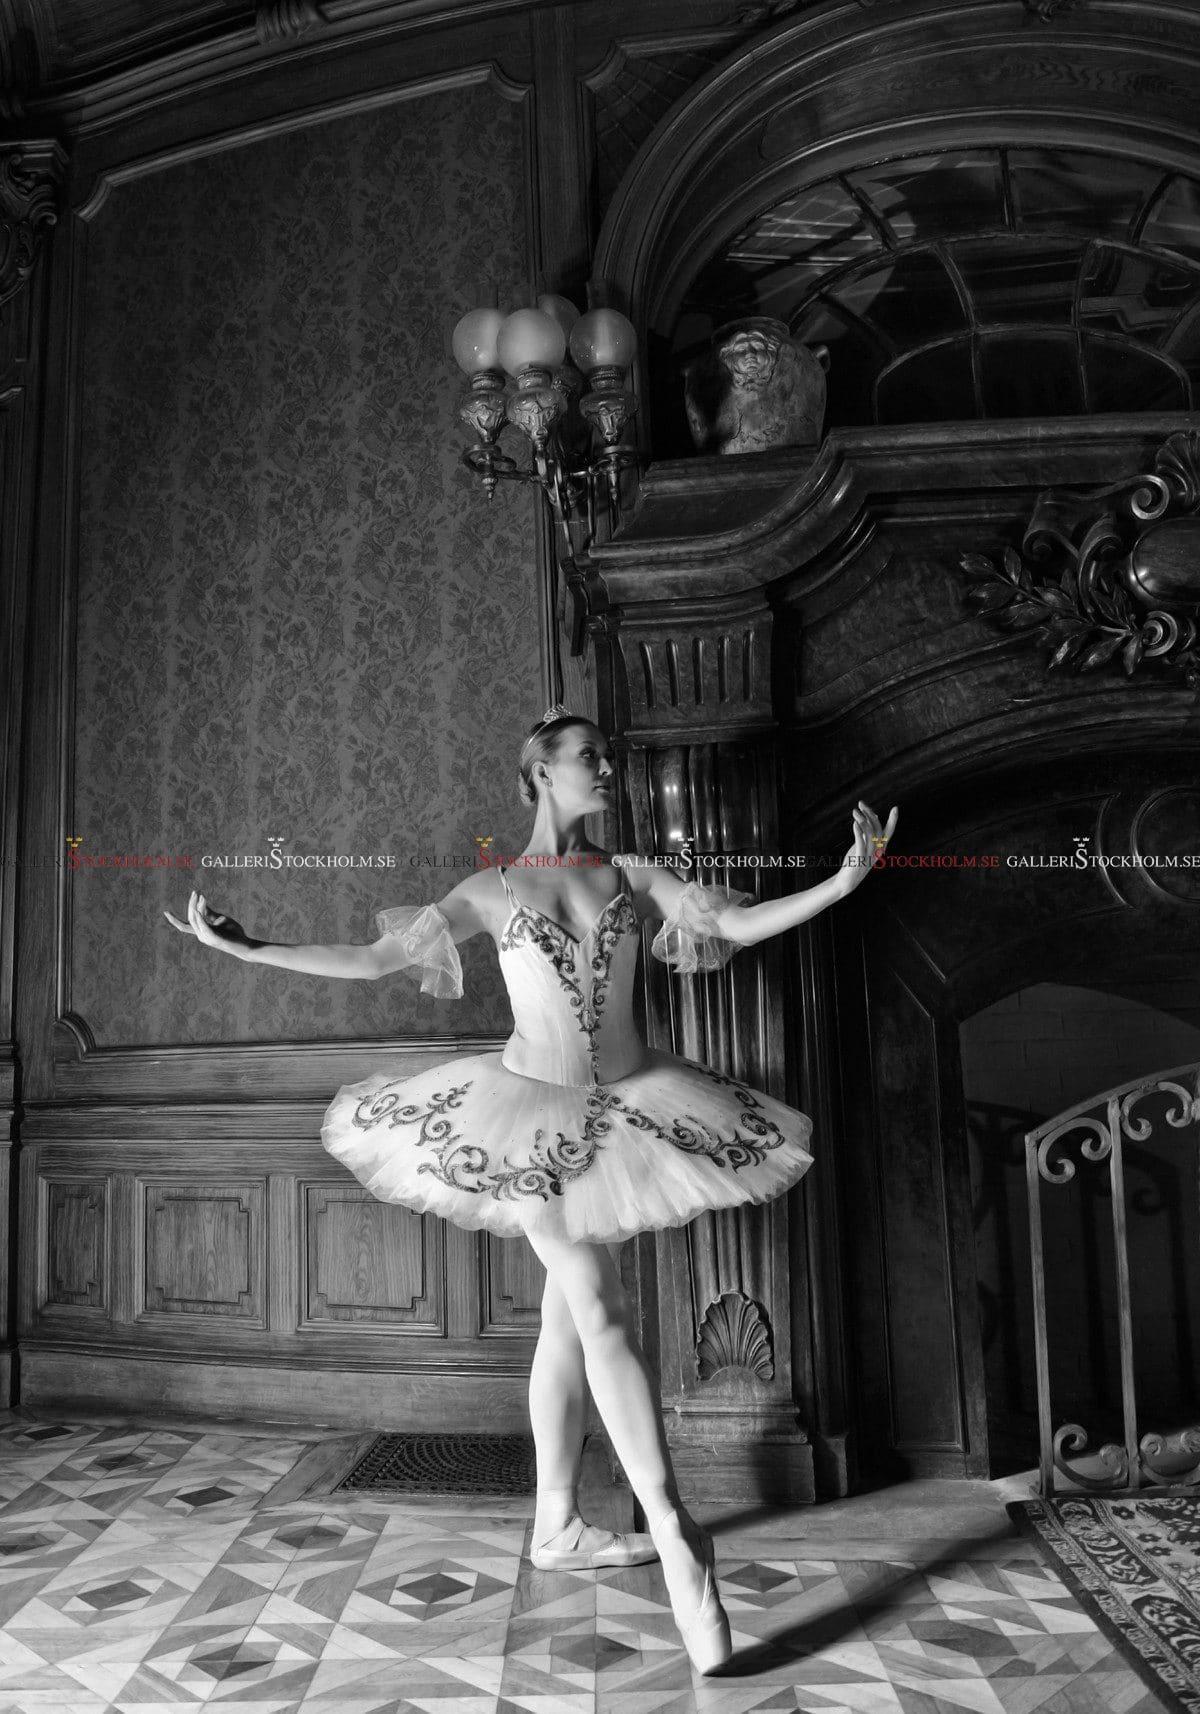 Dmitry Savchenko - Fairy tale